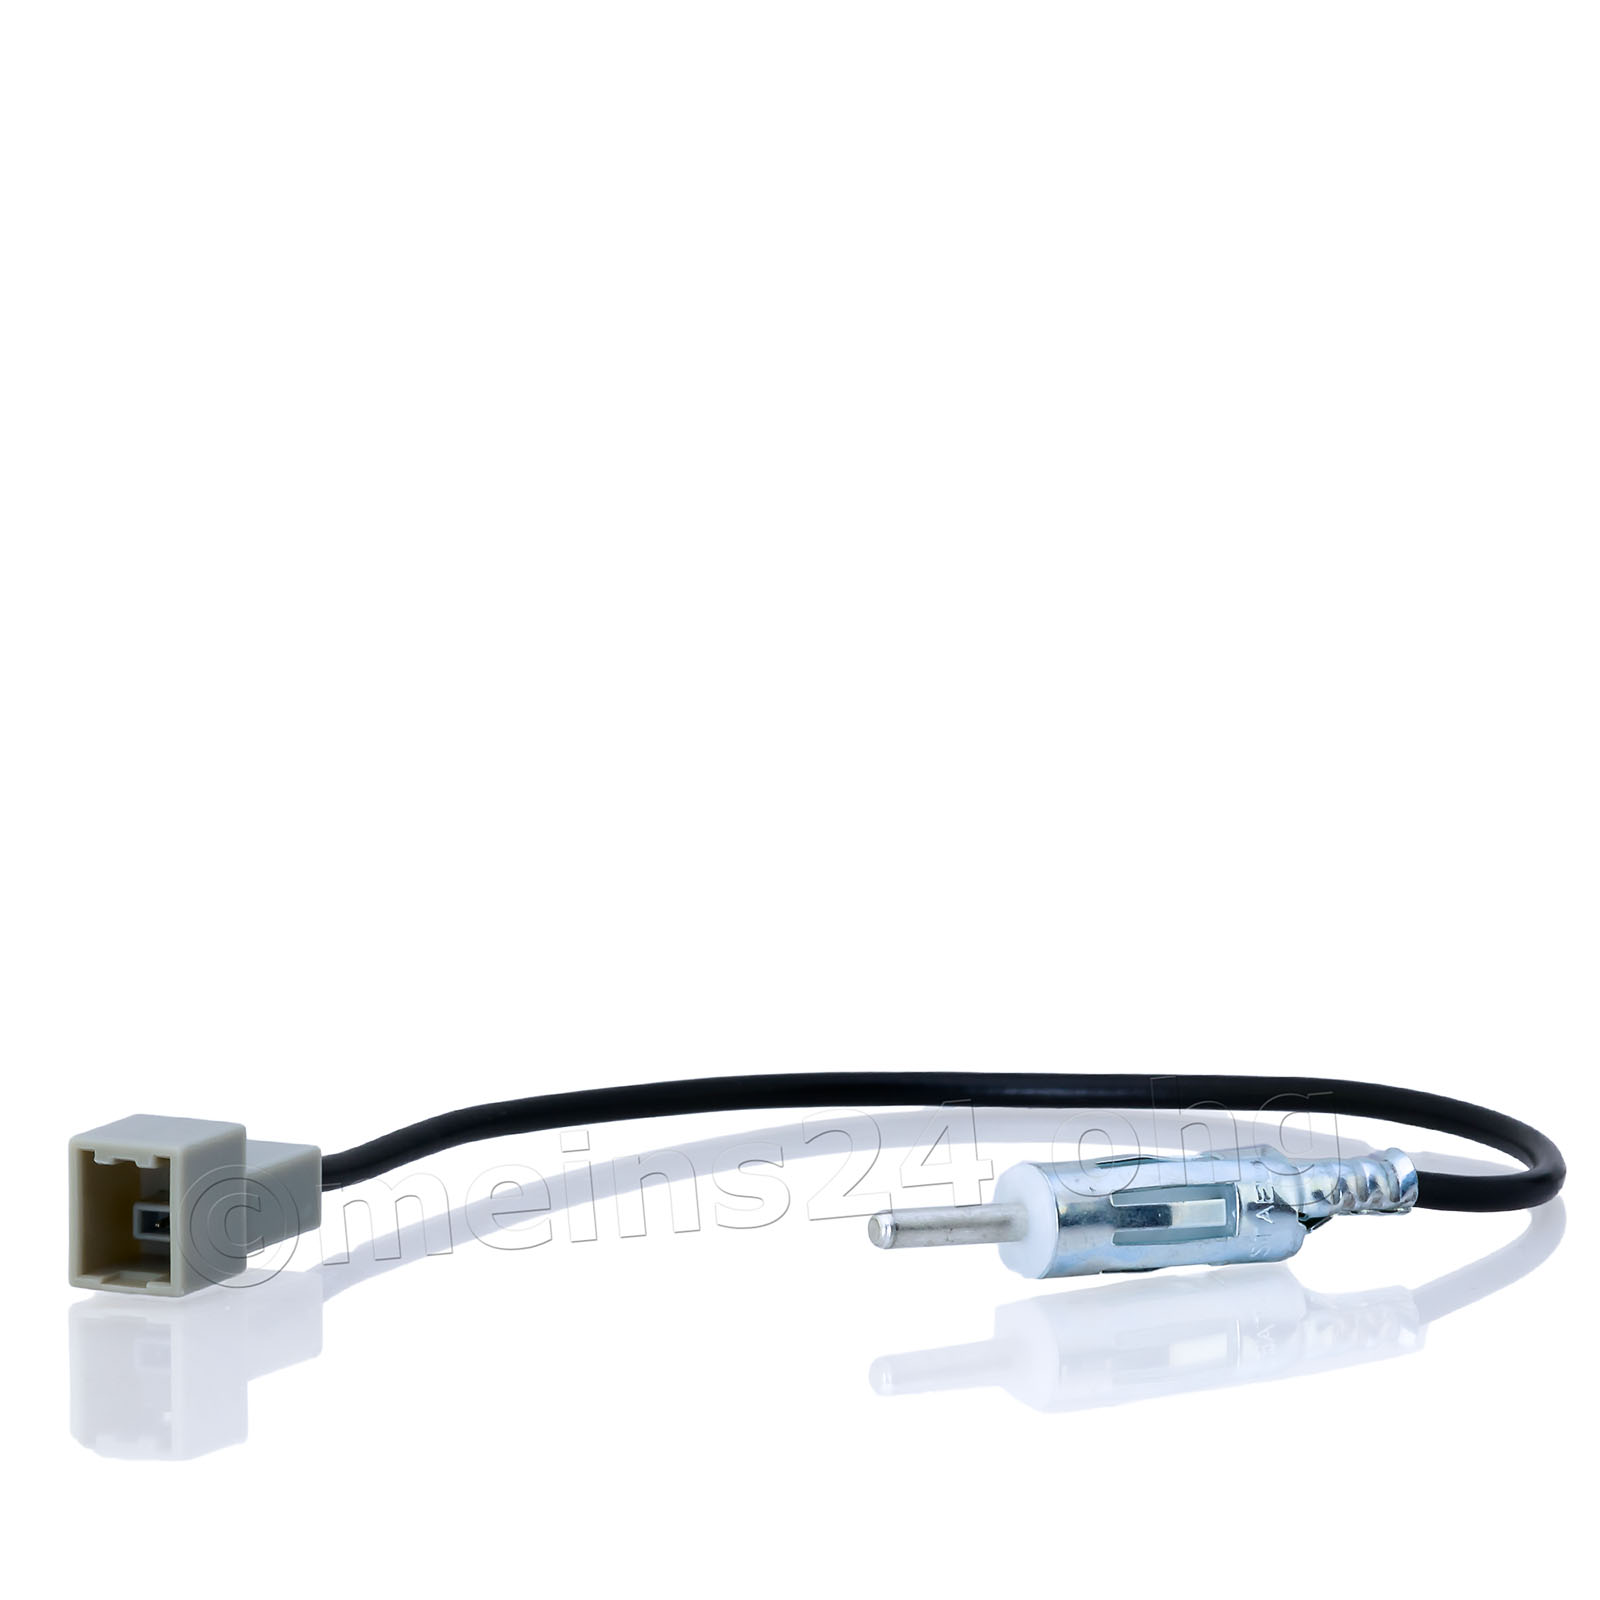 Antennenadapter HYUNDAI KIA Stecker (m) -> DIN Stecker (m) 150 Ohm